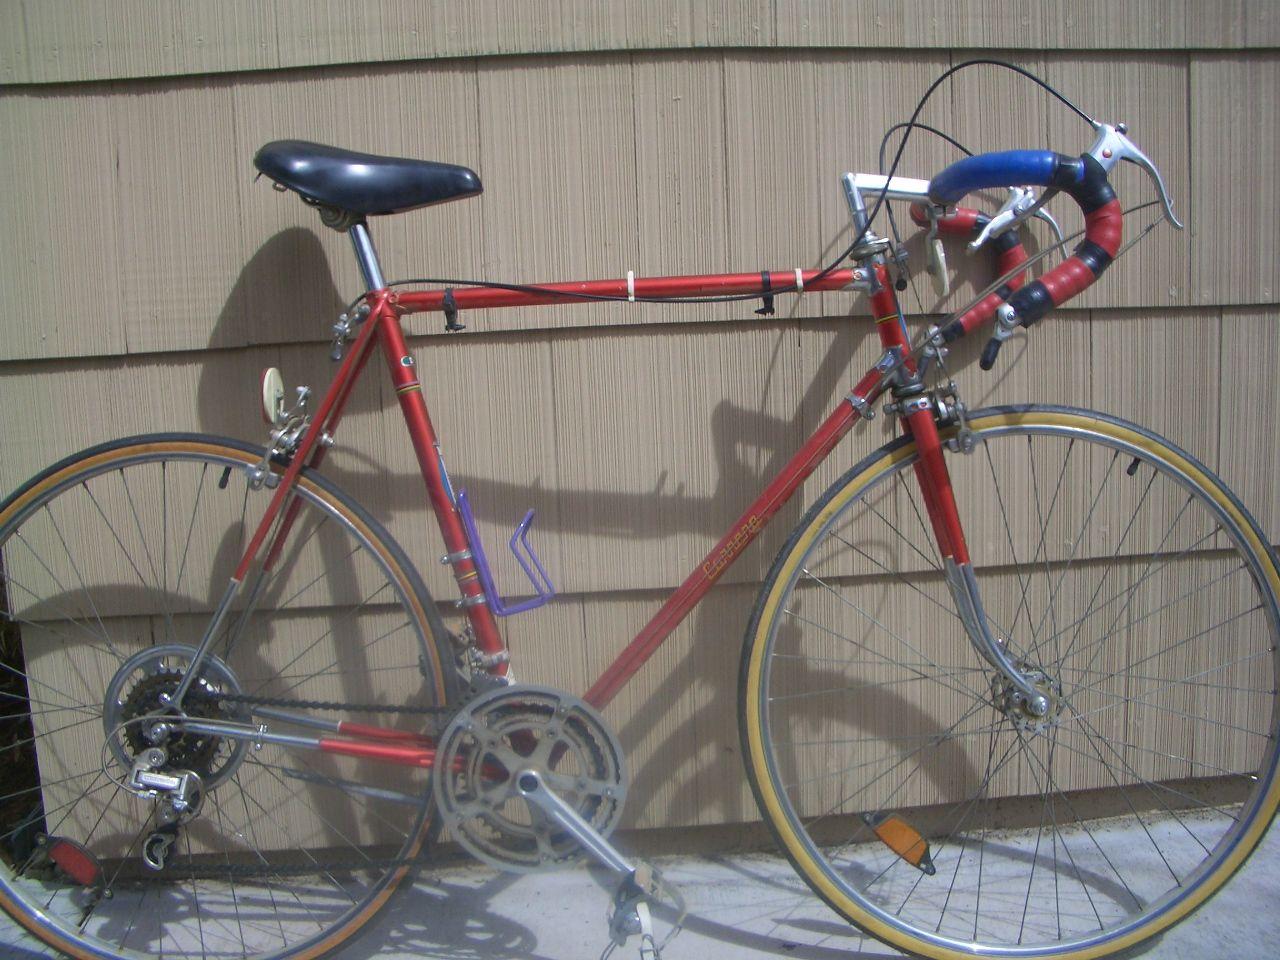 The Catalogs Of Japanese Vintage Bicycle Vintage Bicycles Bicycle Urban Bicycle